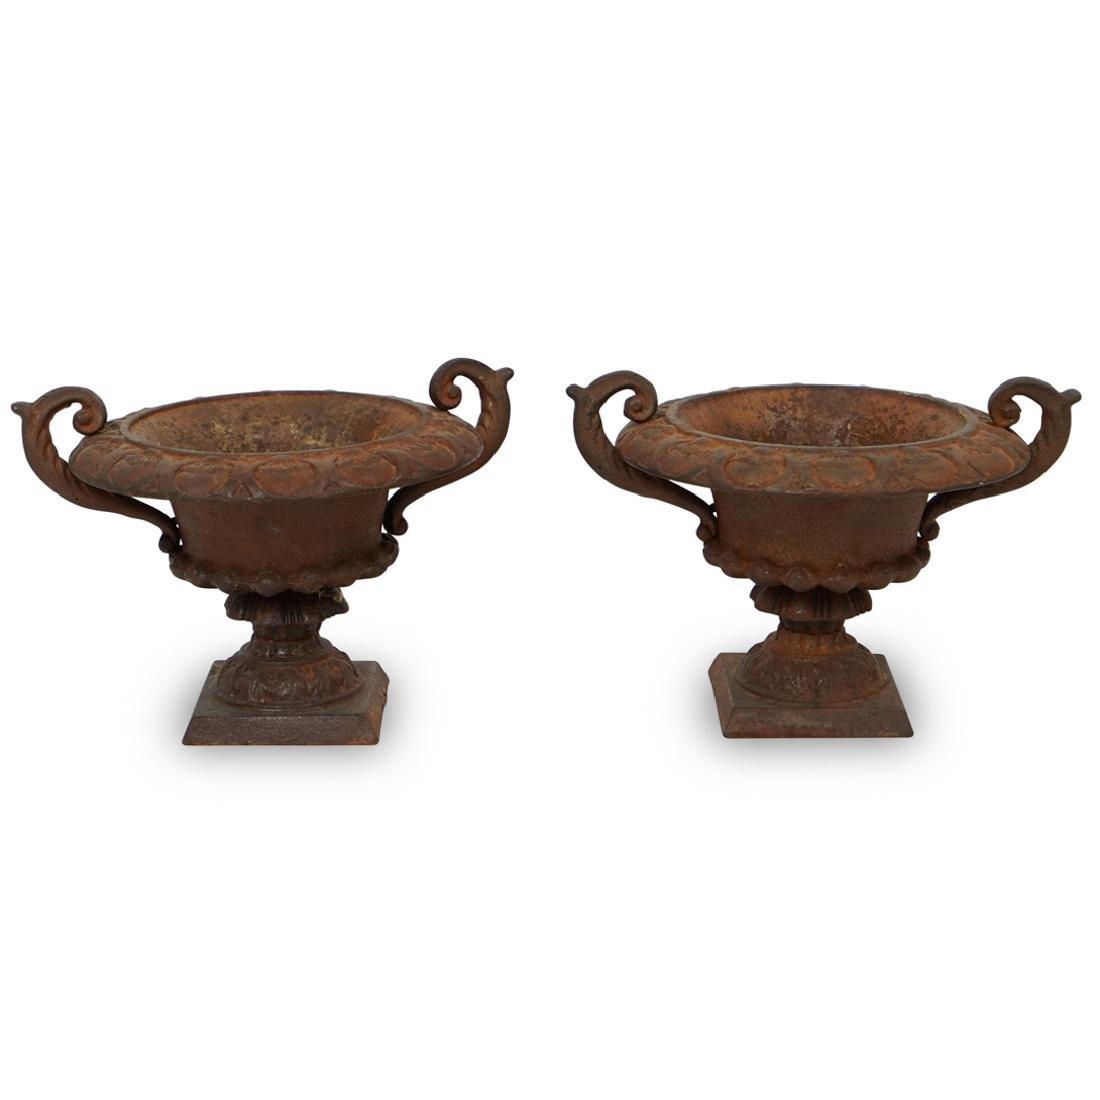 Pair of Iron Urn Planters